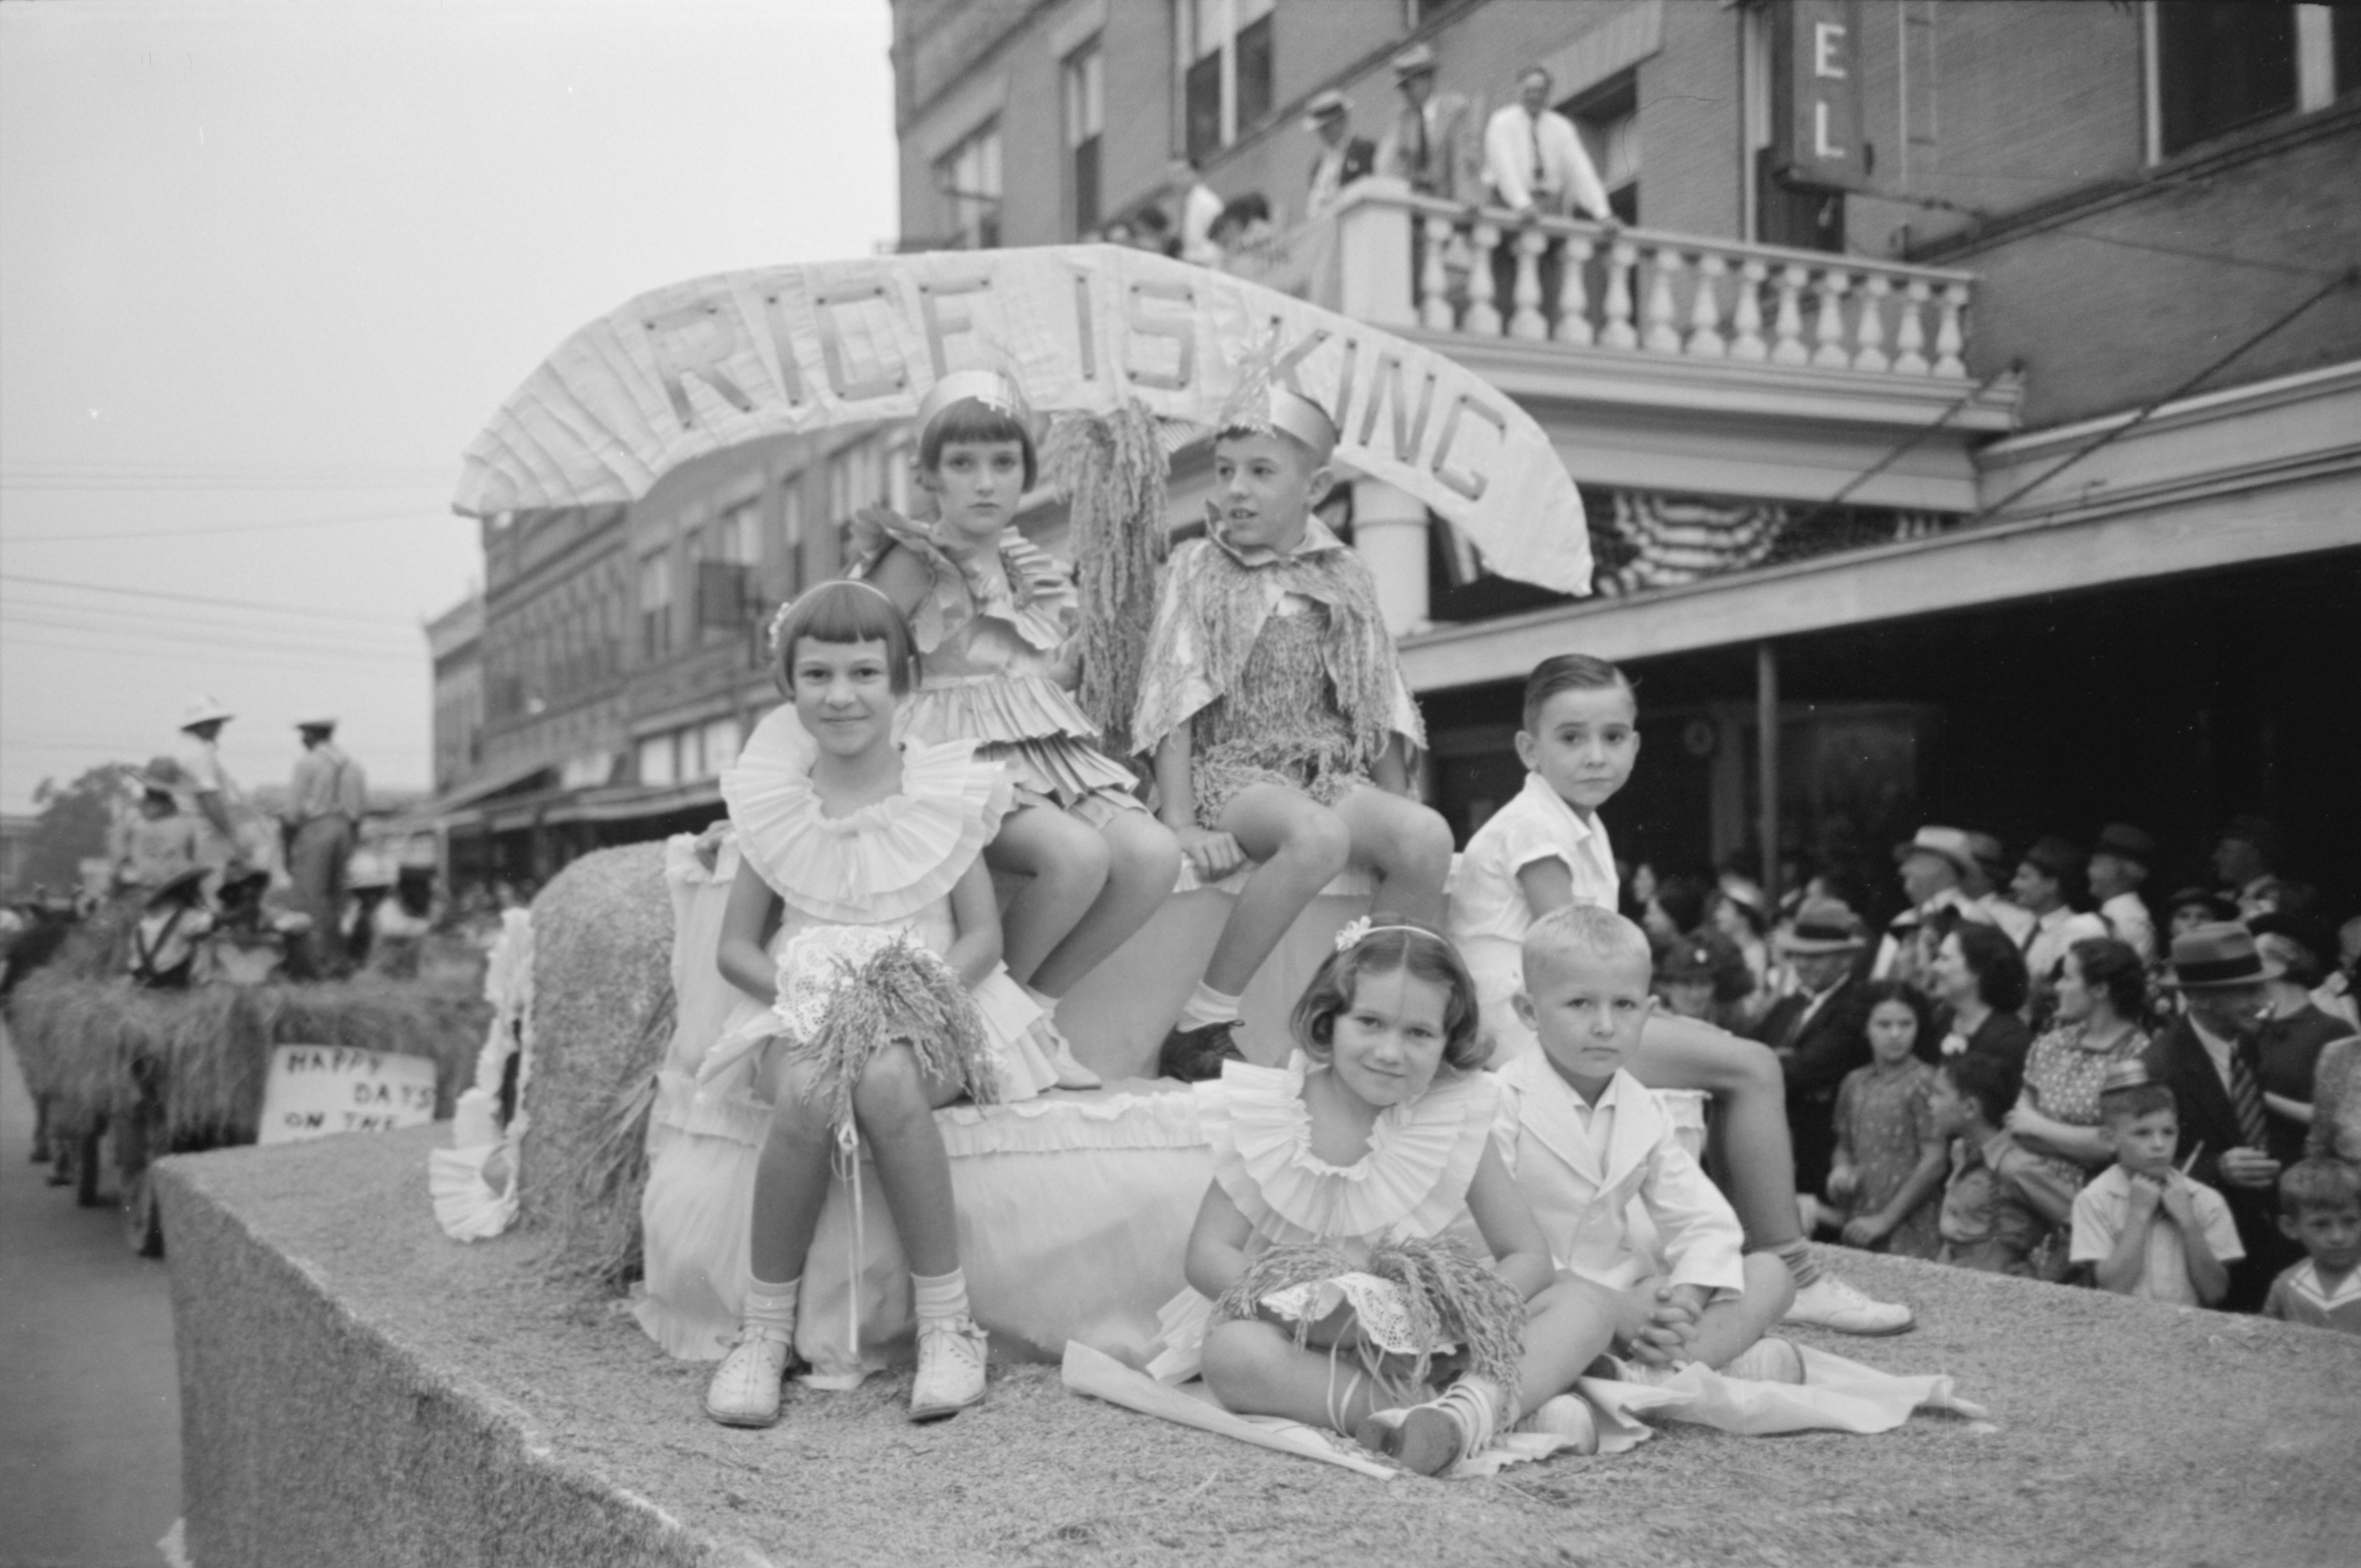 RiceIsKingCrowley1938